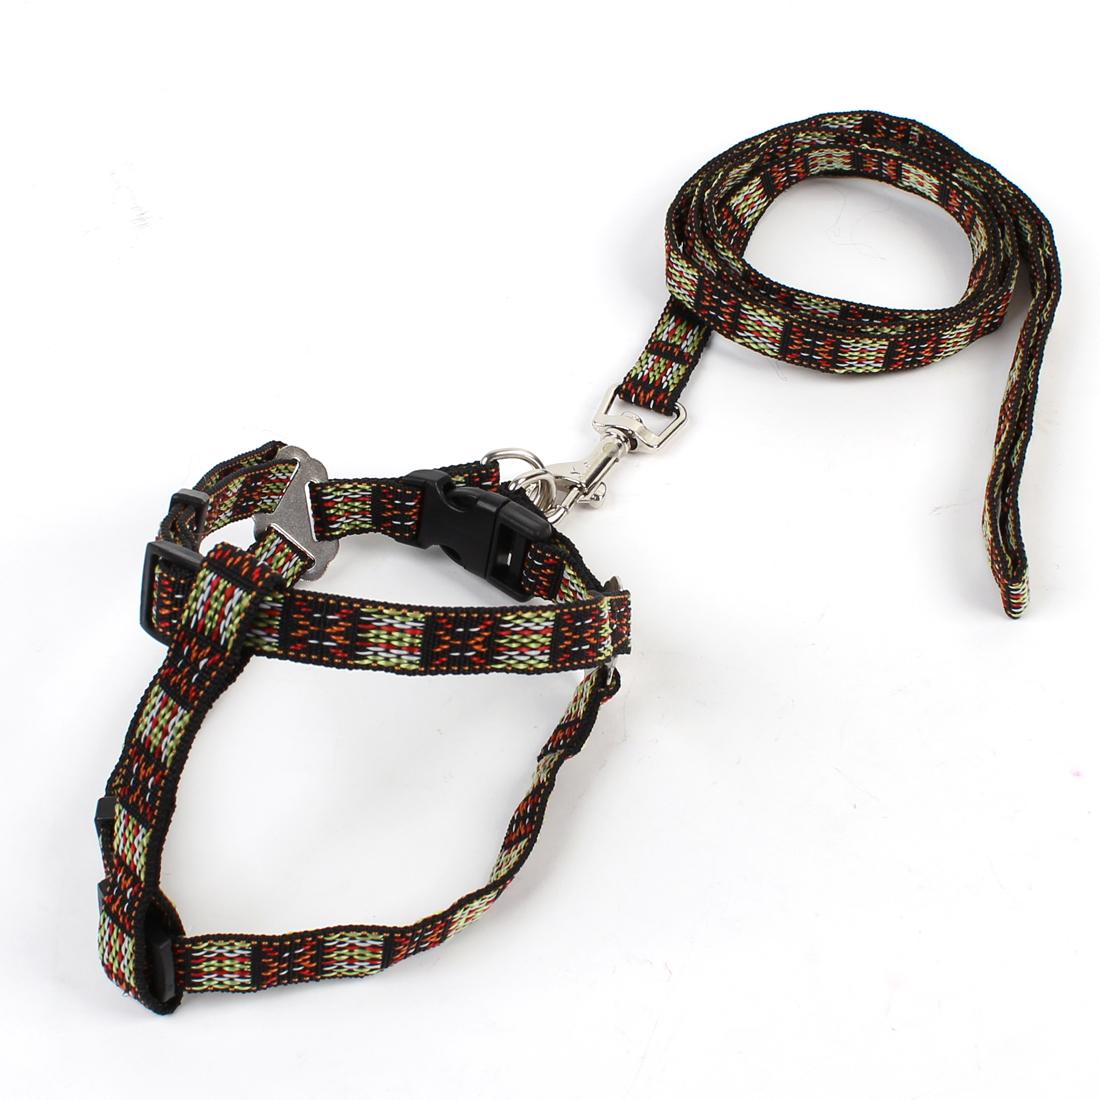 1.1M Long Lead Multicolored Doggie Dog Pet Collar Halter Harness Leash